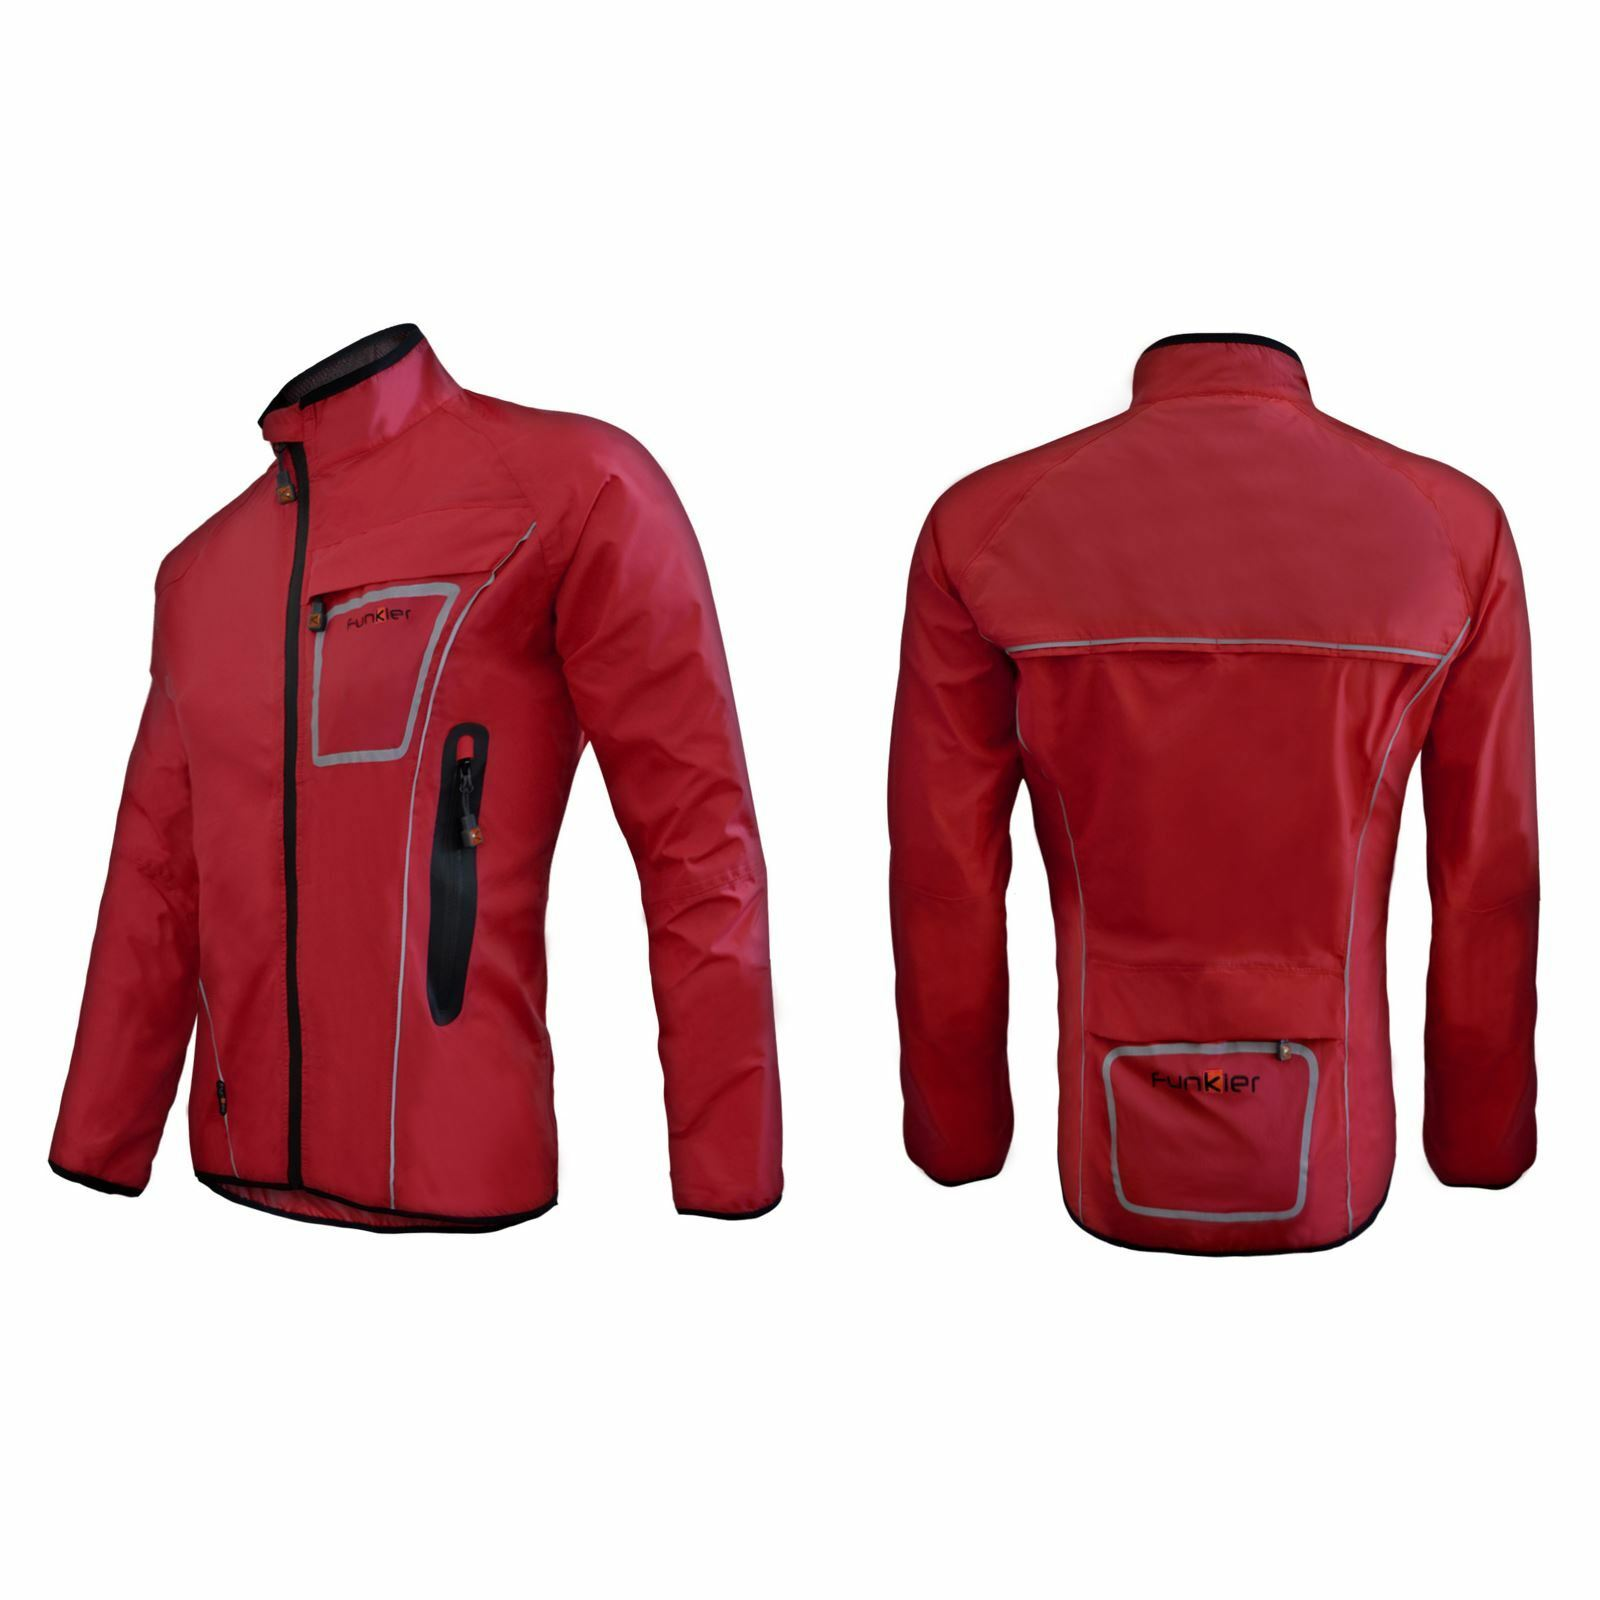 Funkier ciclón WJ-1317 Impermeable Chaqueta para lluvia totalmente Costuras Selladas Rojo XXX-grande